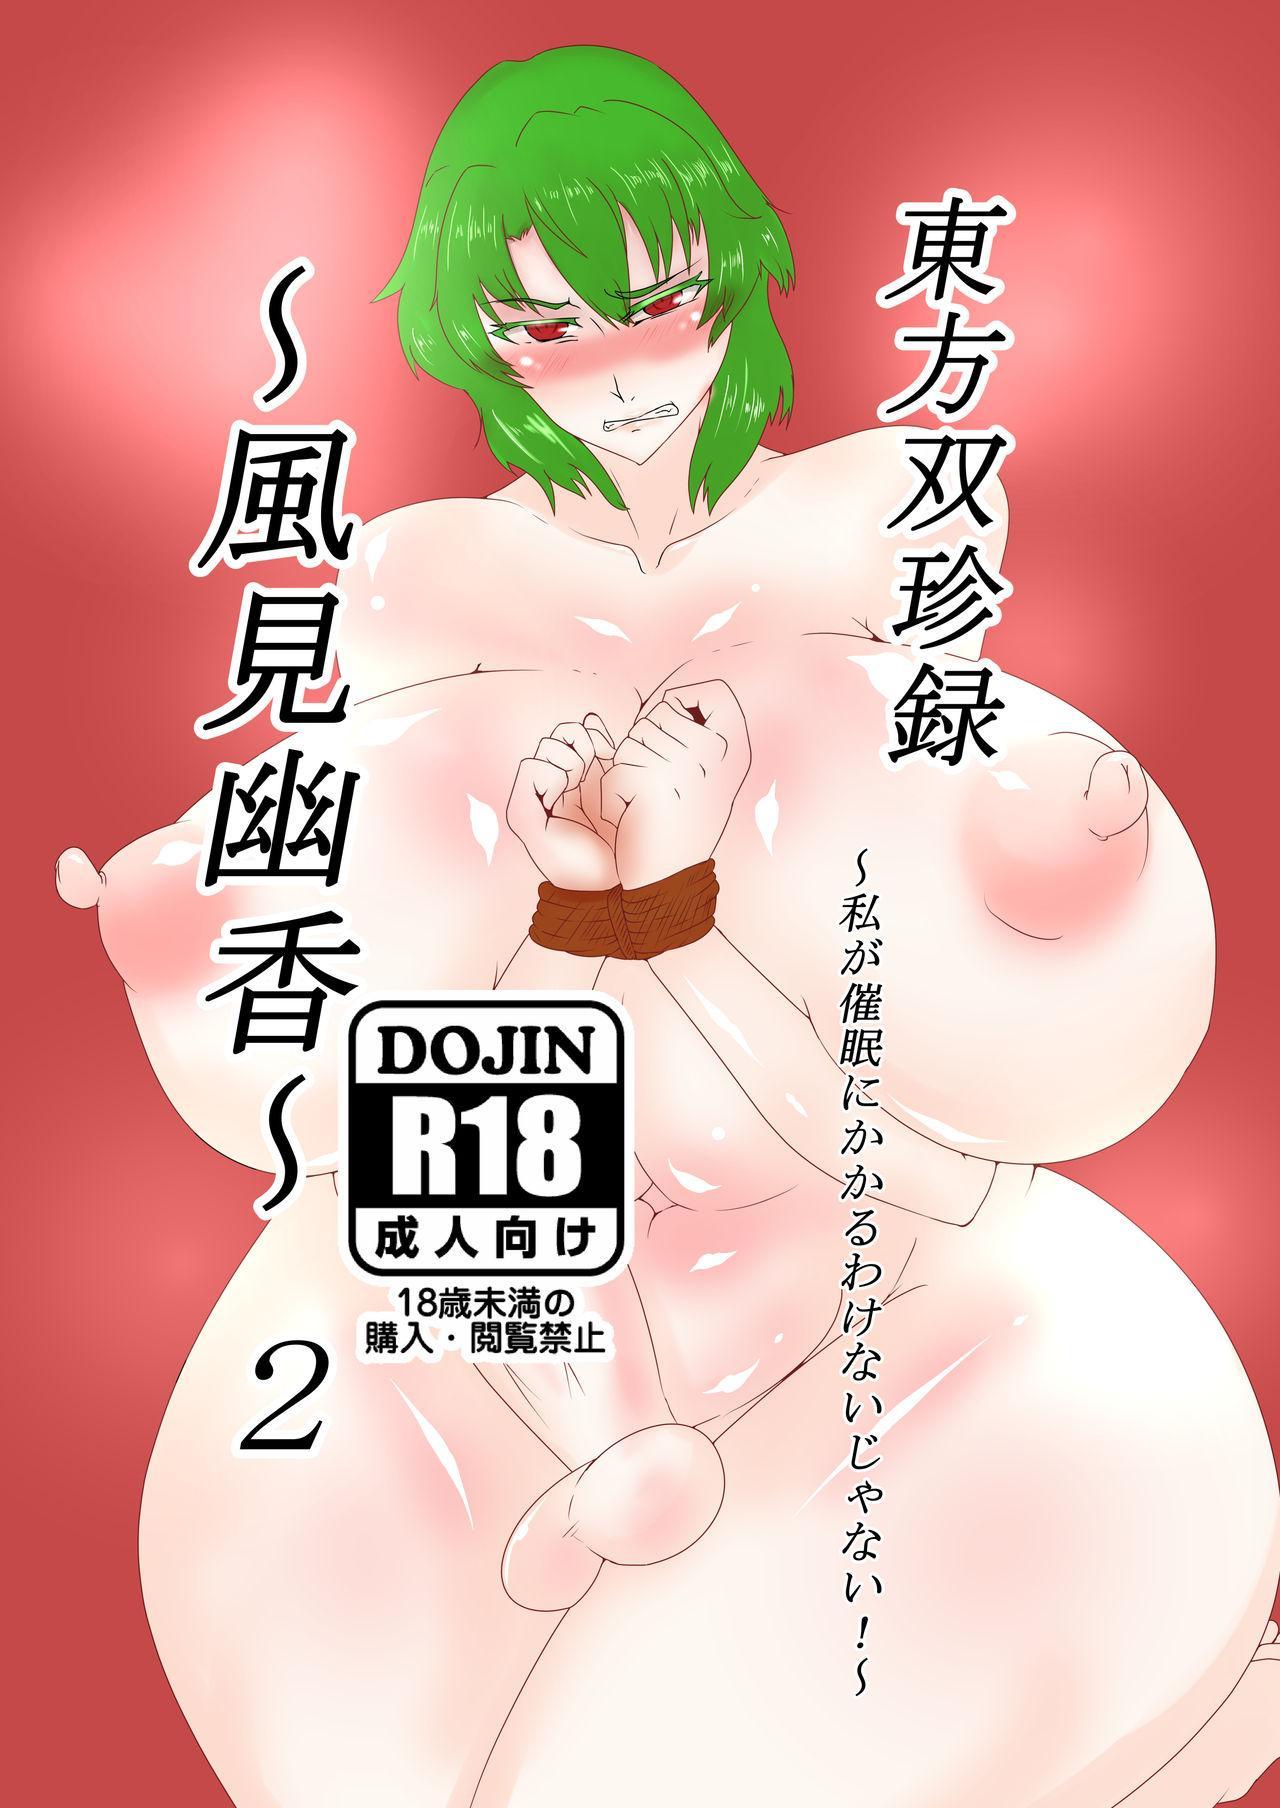 [Black_Sugar(Kari) (Kuroi Megane)] Touhou Futabusa ~Kazami Yuuka~ 2 (Touhou Project) [Digital] 0